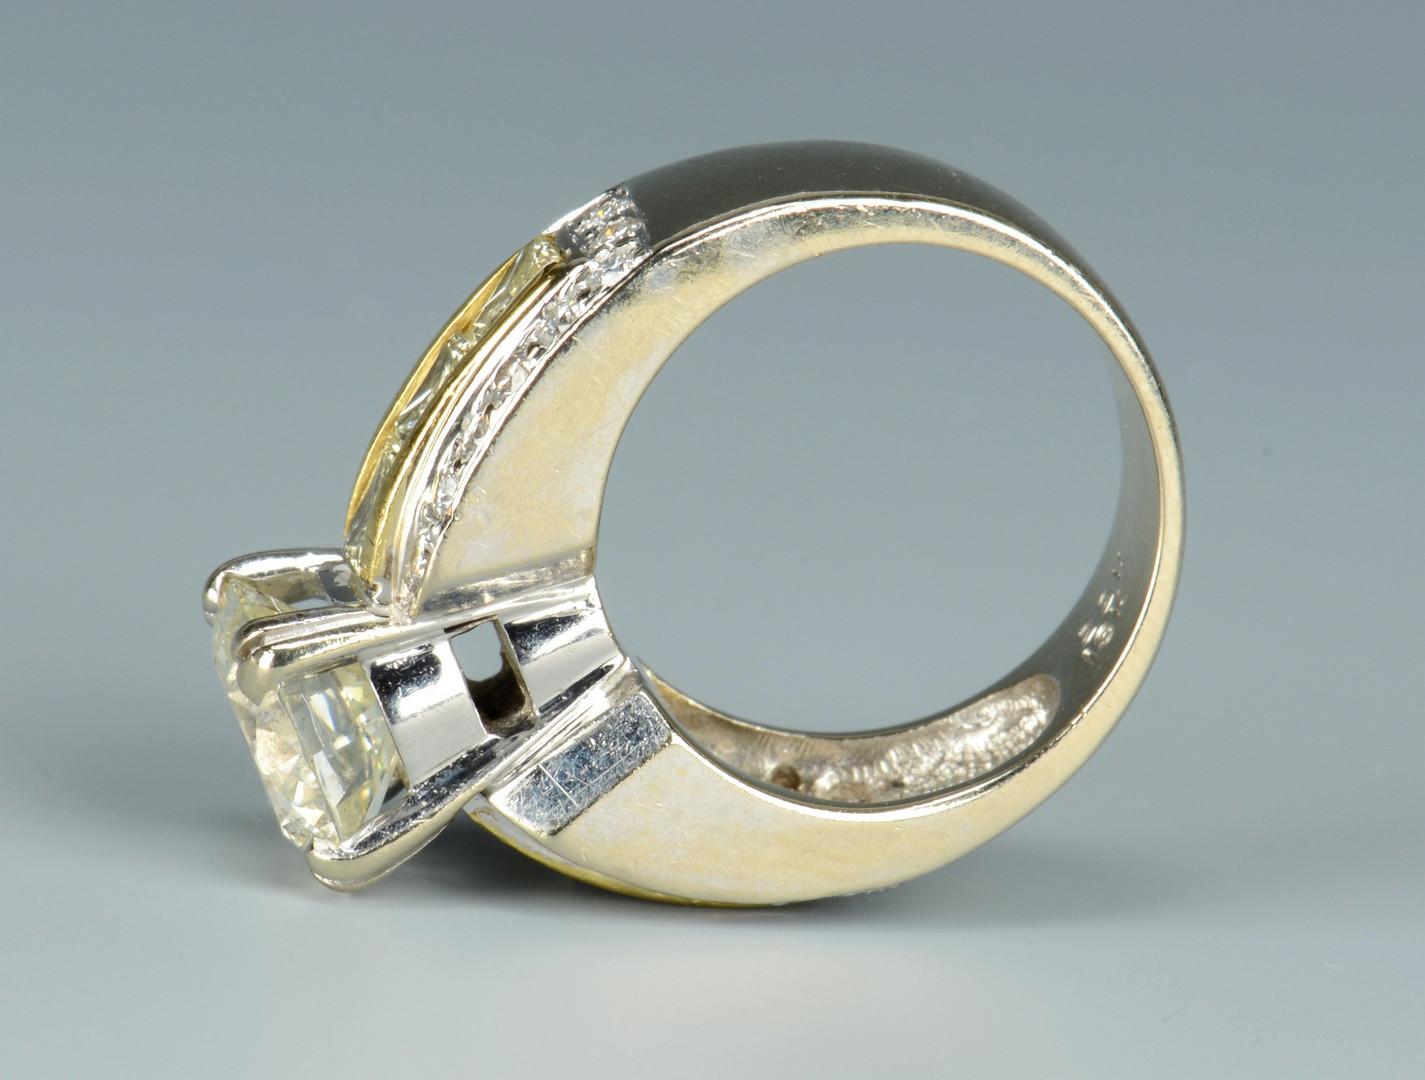 Lot 254: 3.08 ct Diamond Ring